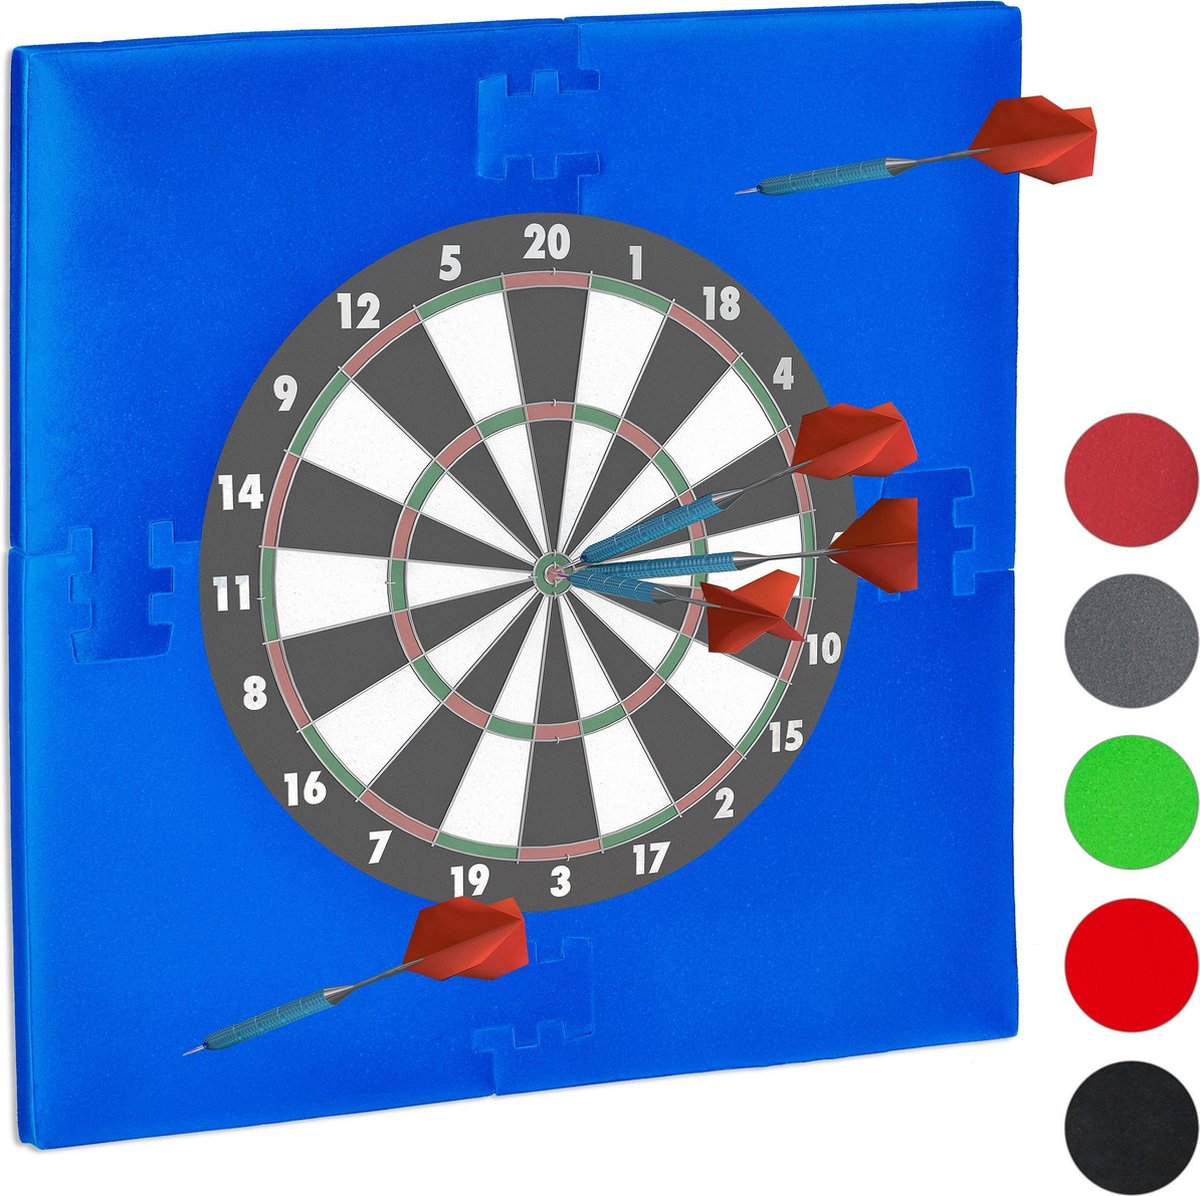 relaxdays dartbord surround ring - beschermrand - beschermring - ring voor dartbord - 45cm blauw